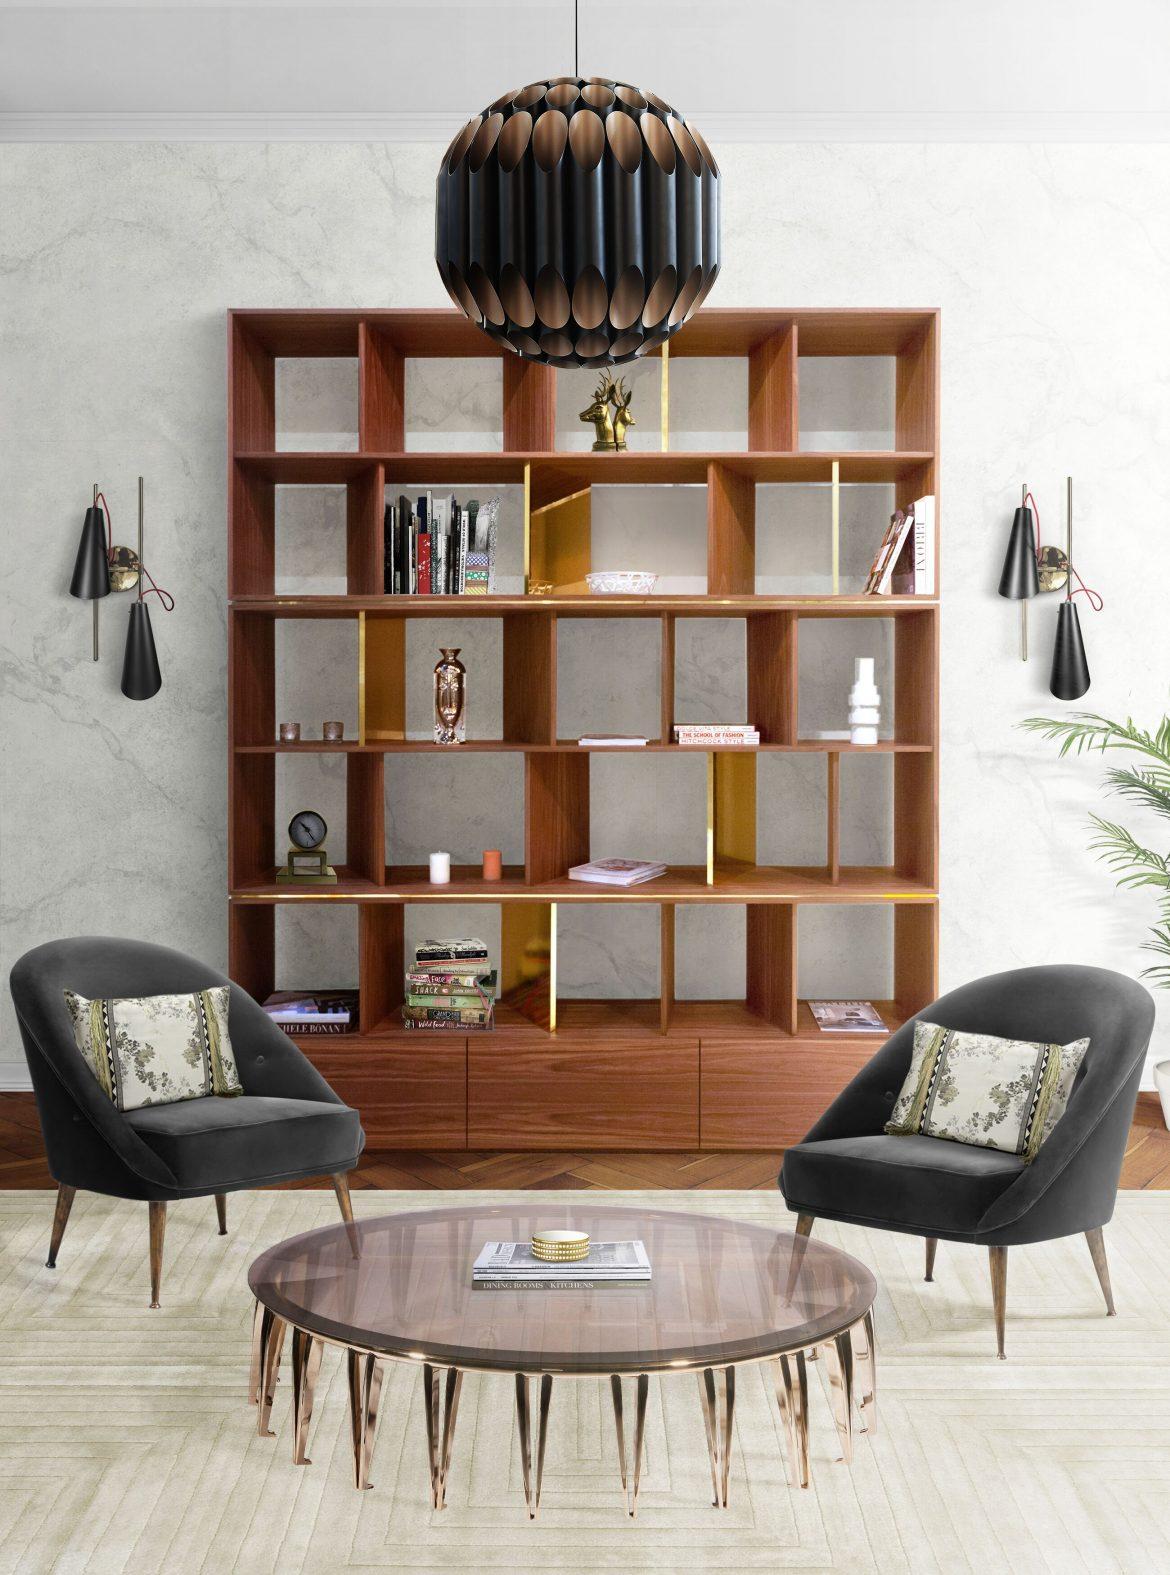 living room ideas 30 Best Living Room Ideas For 2020 best living room ideas 2020 20